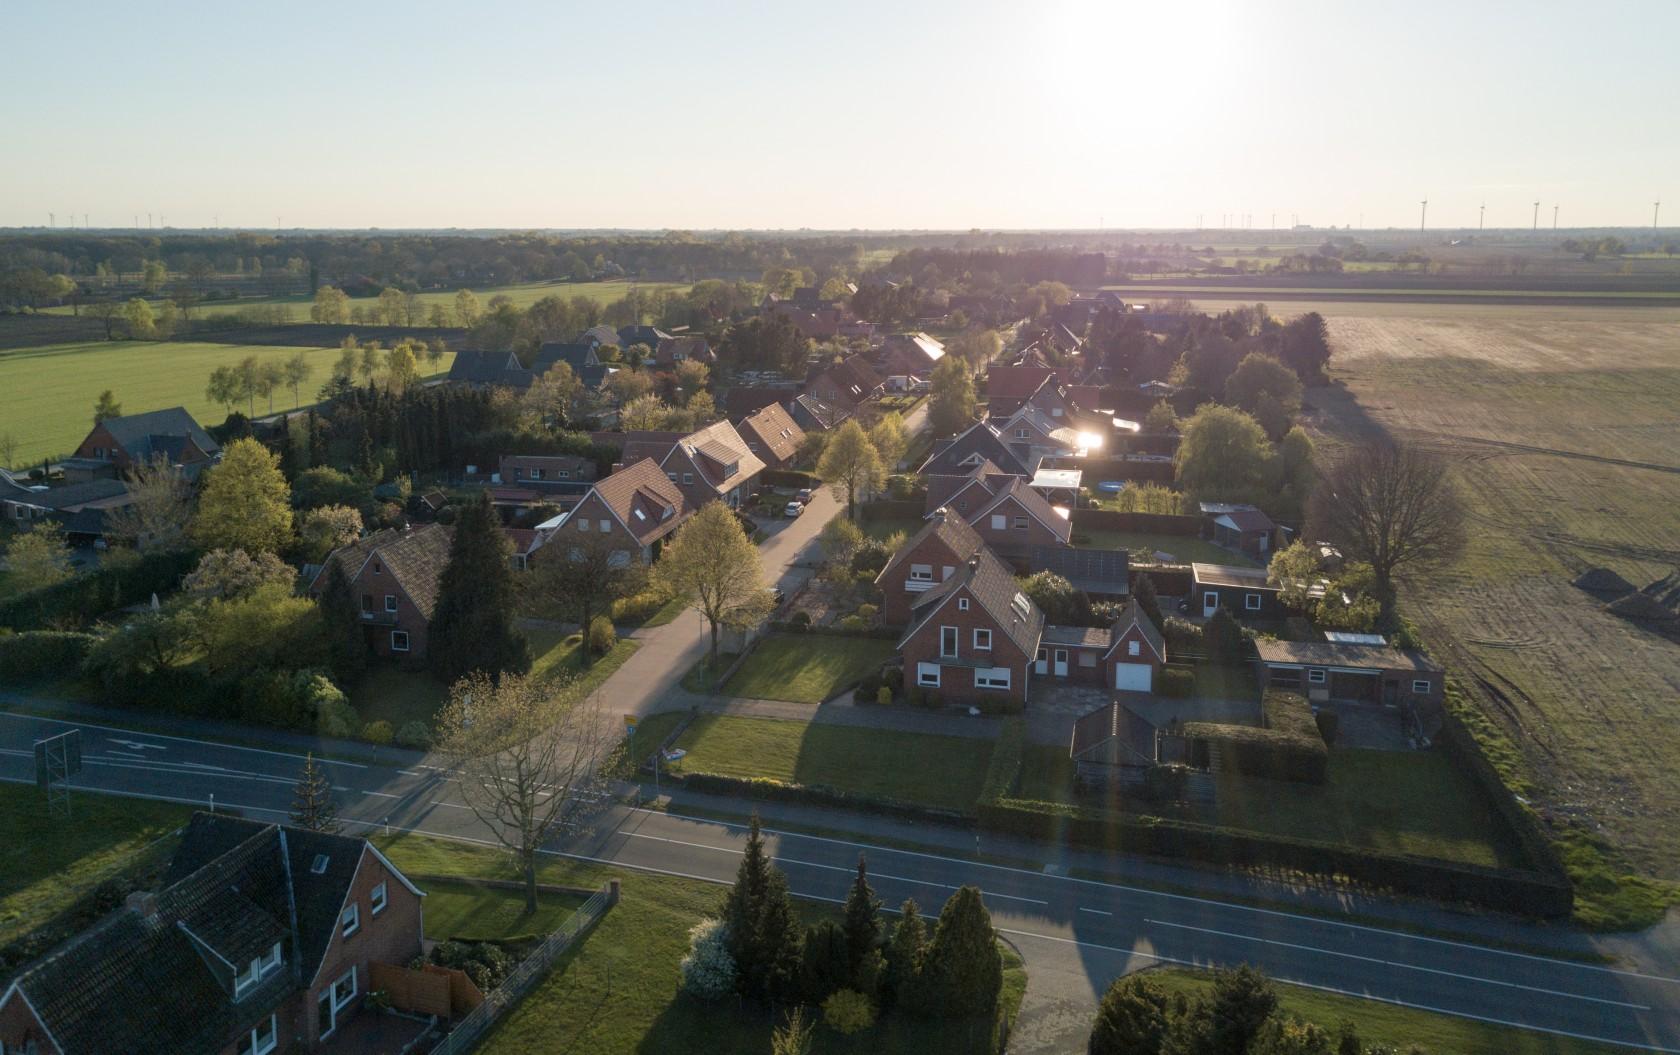 Luftaufnahme vom Hof, Firma, Ortsteil, Drohne